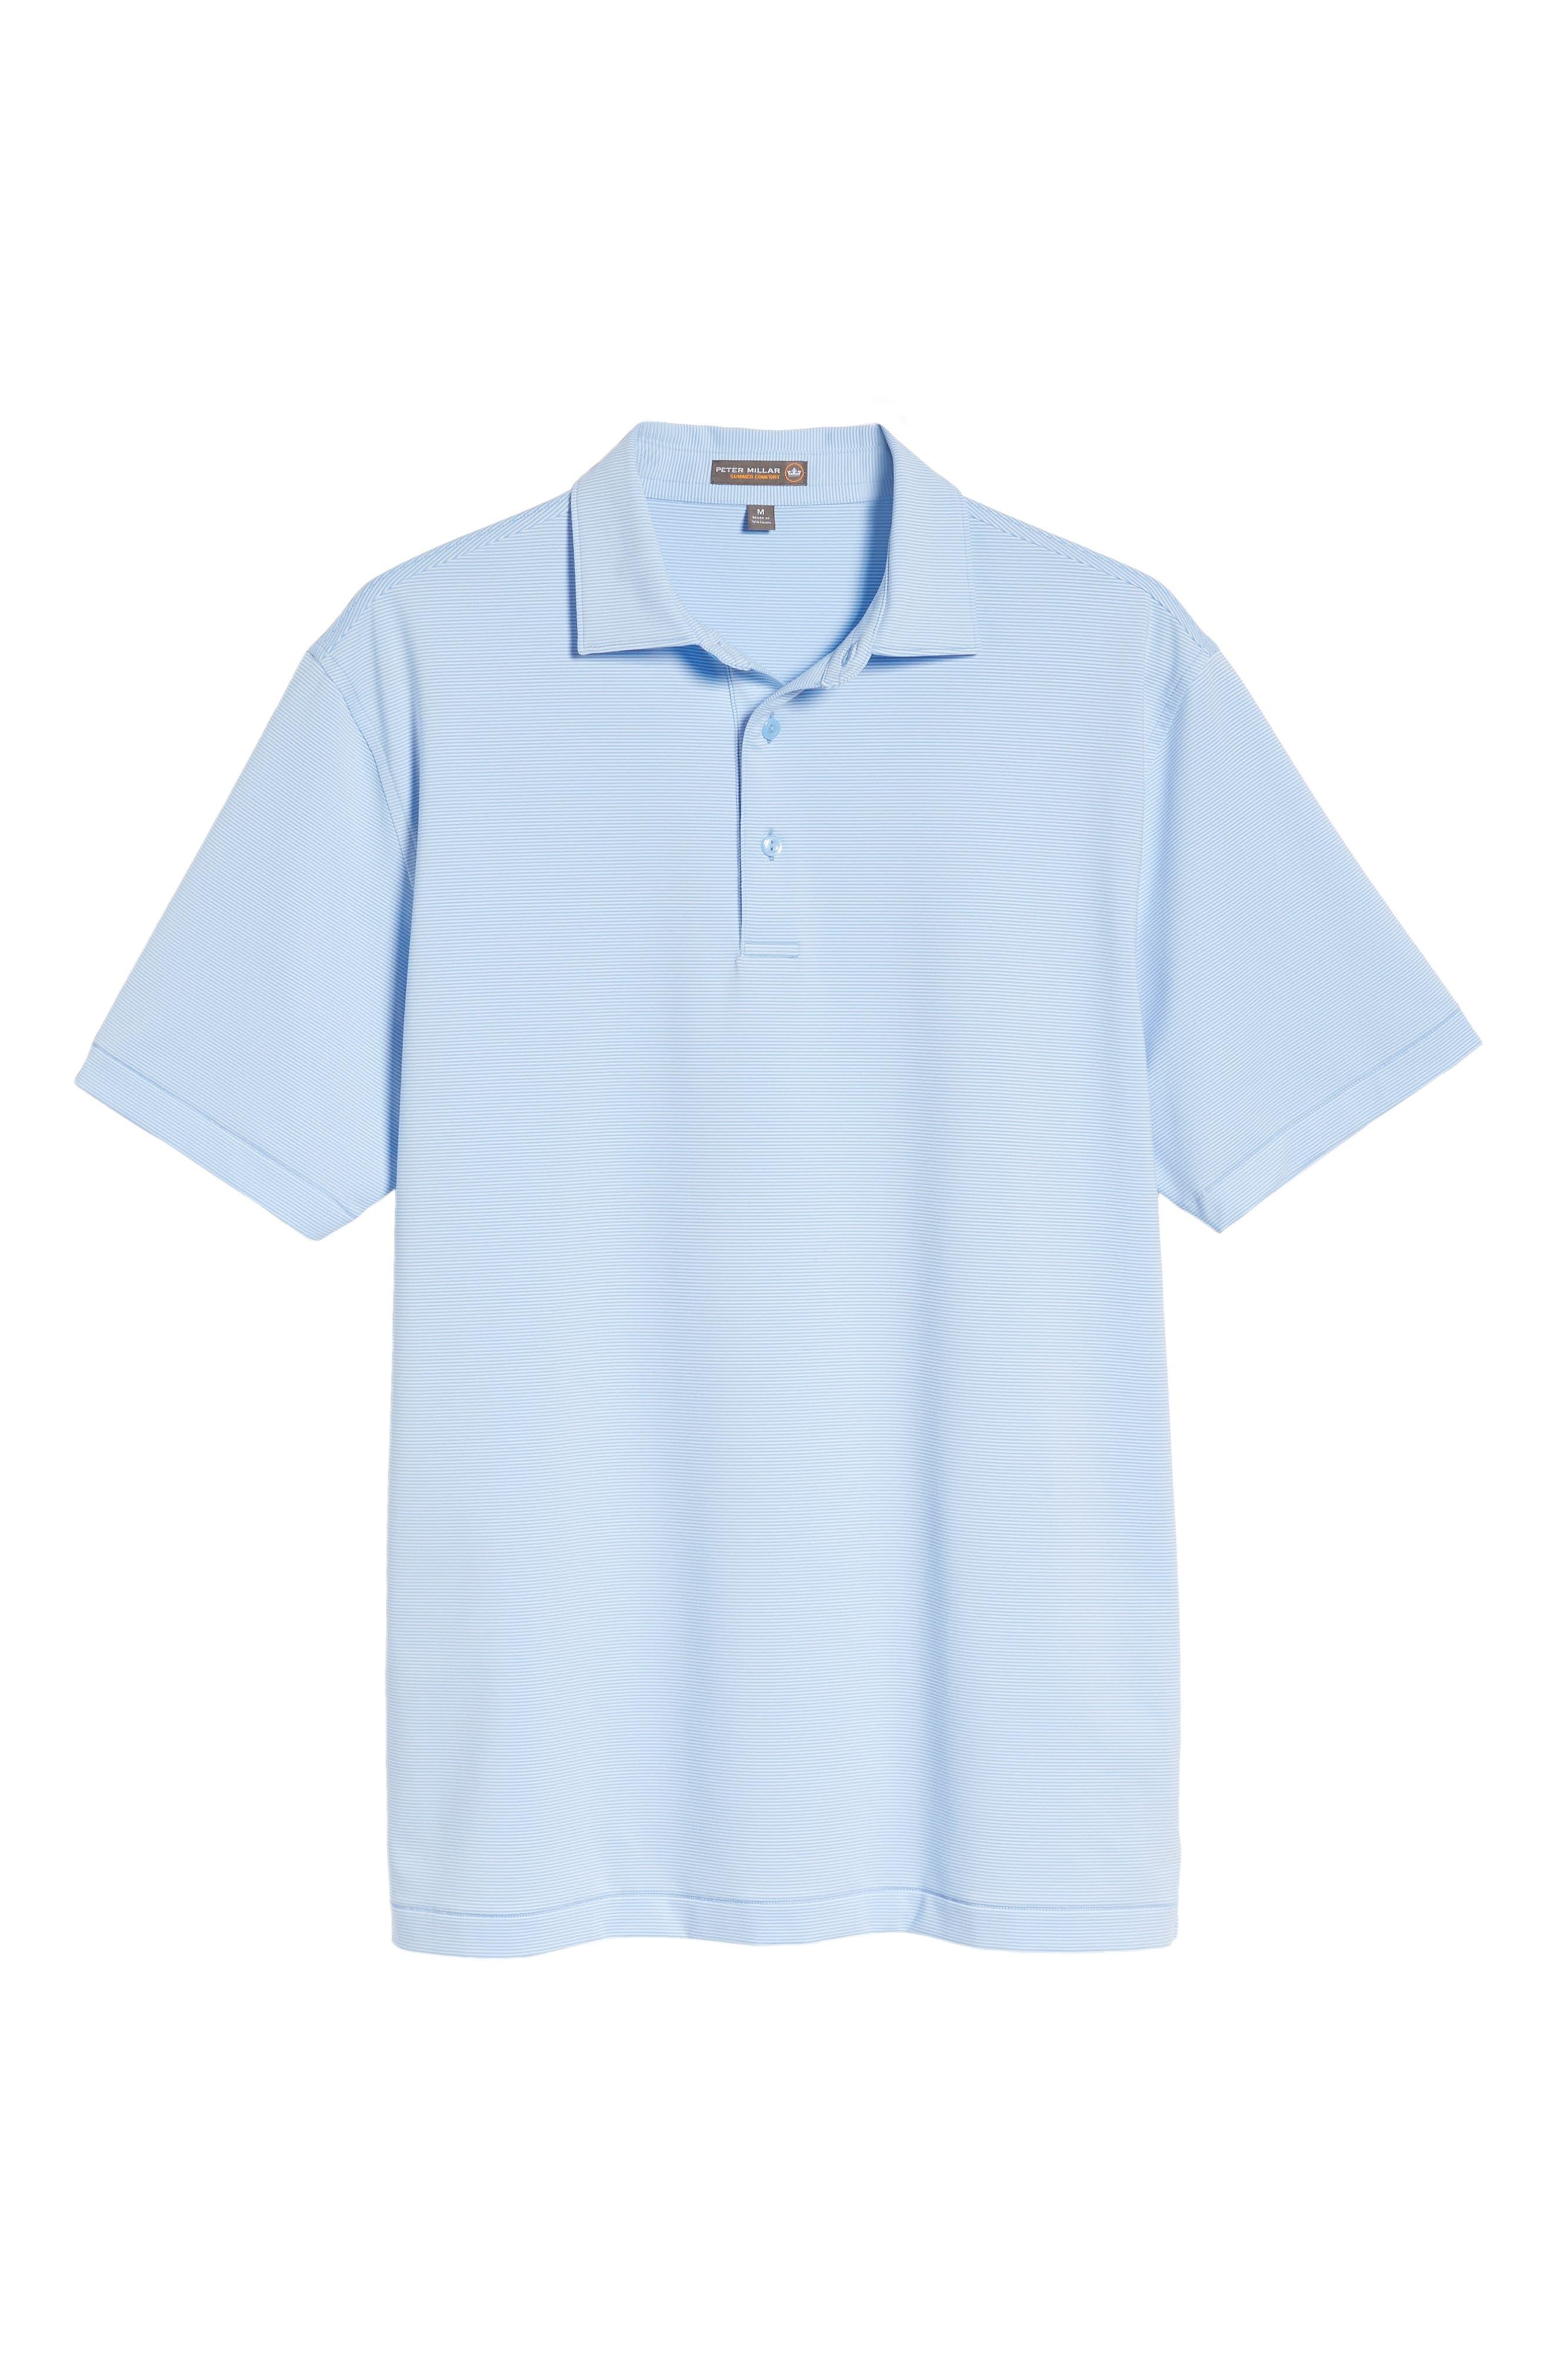 Sean Jubilee Stripe Jersey Polo,                             Alternate thumbnail 28, color,